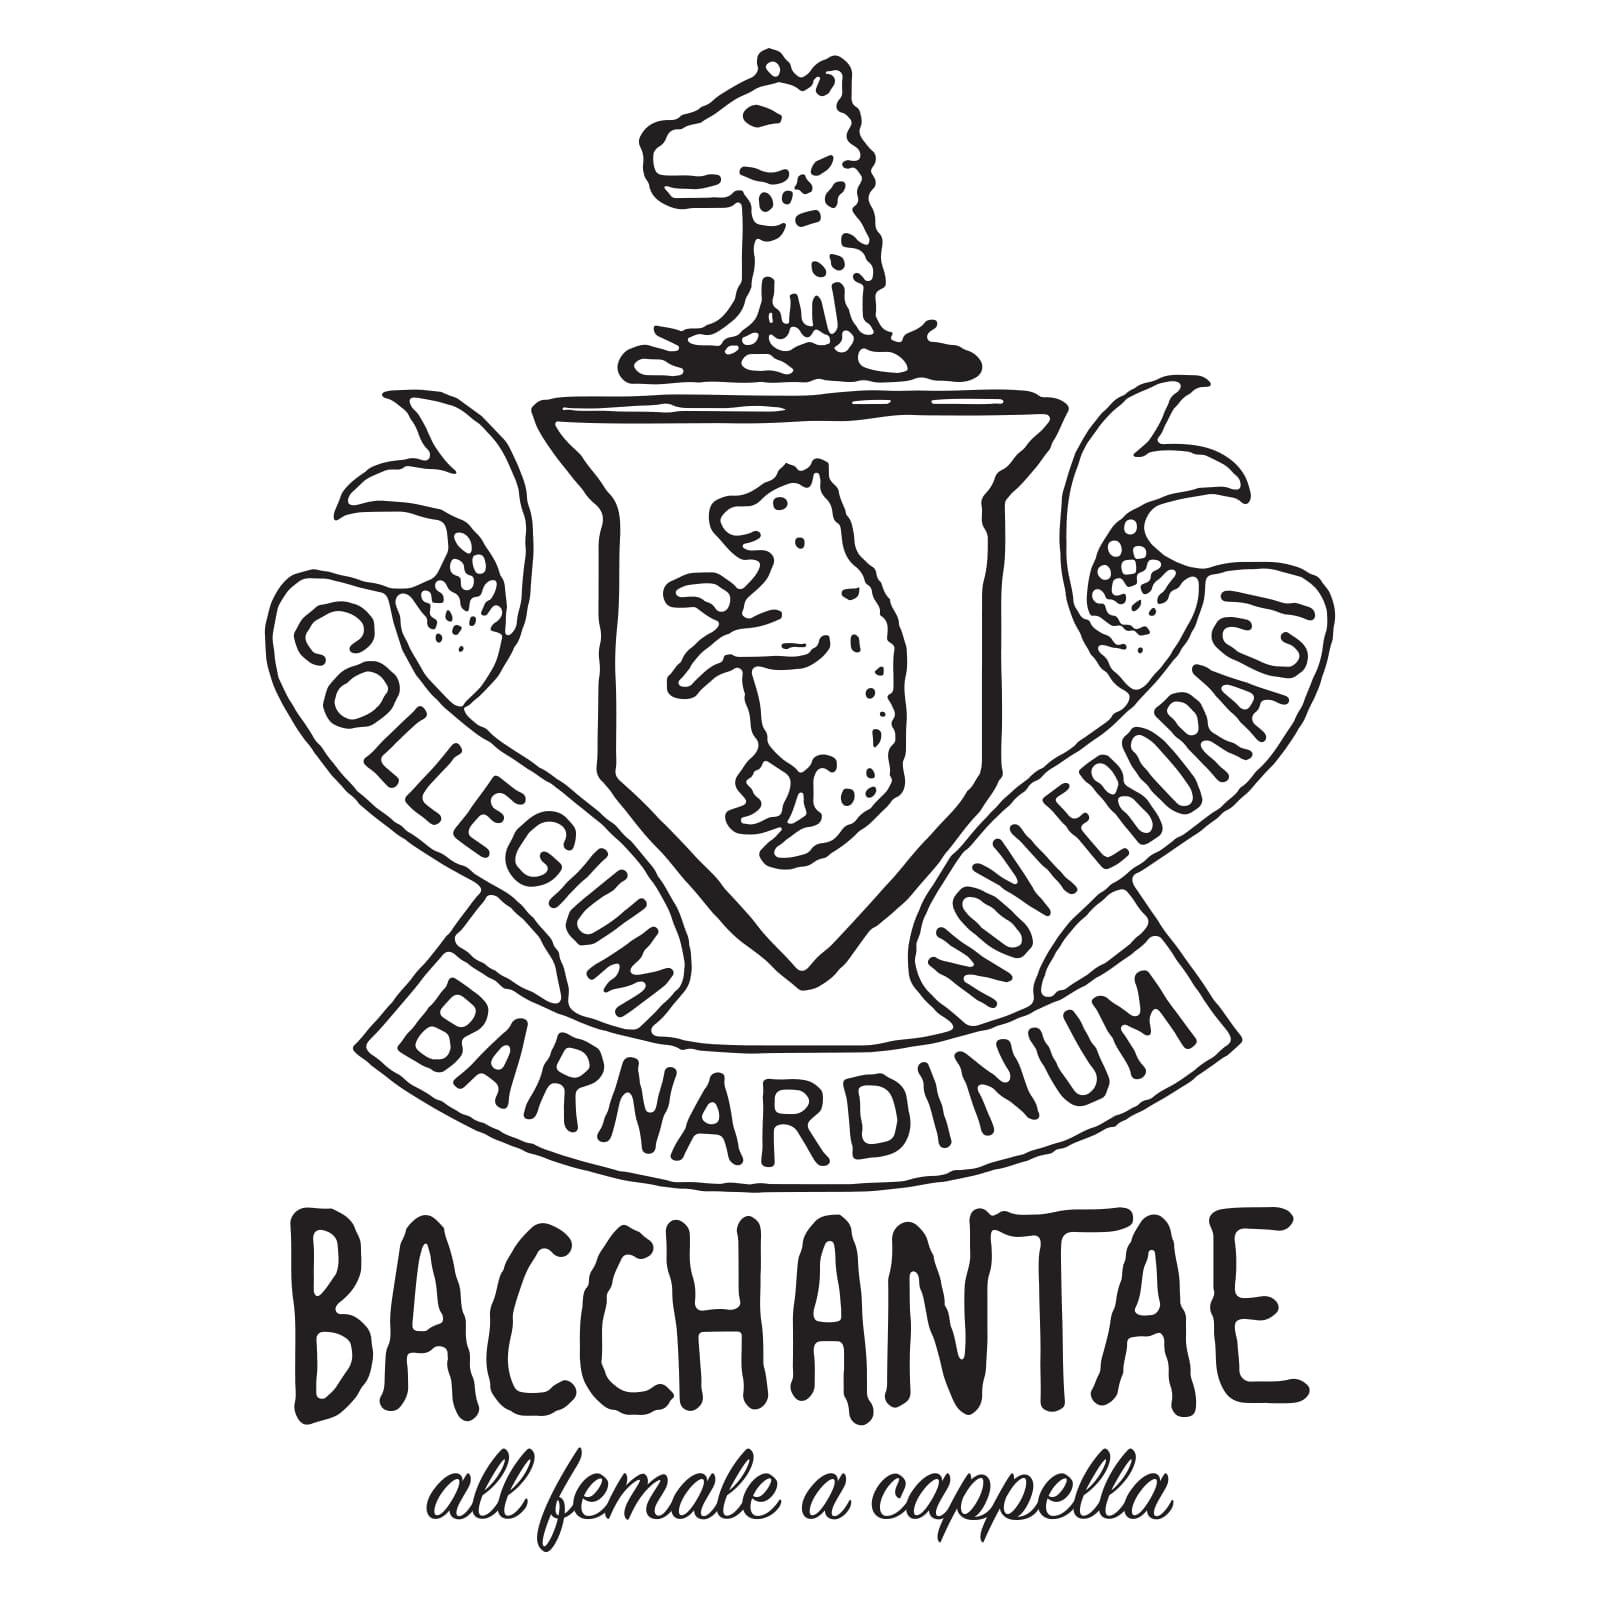 Meet Bacchantae Current Members